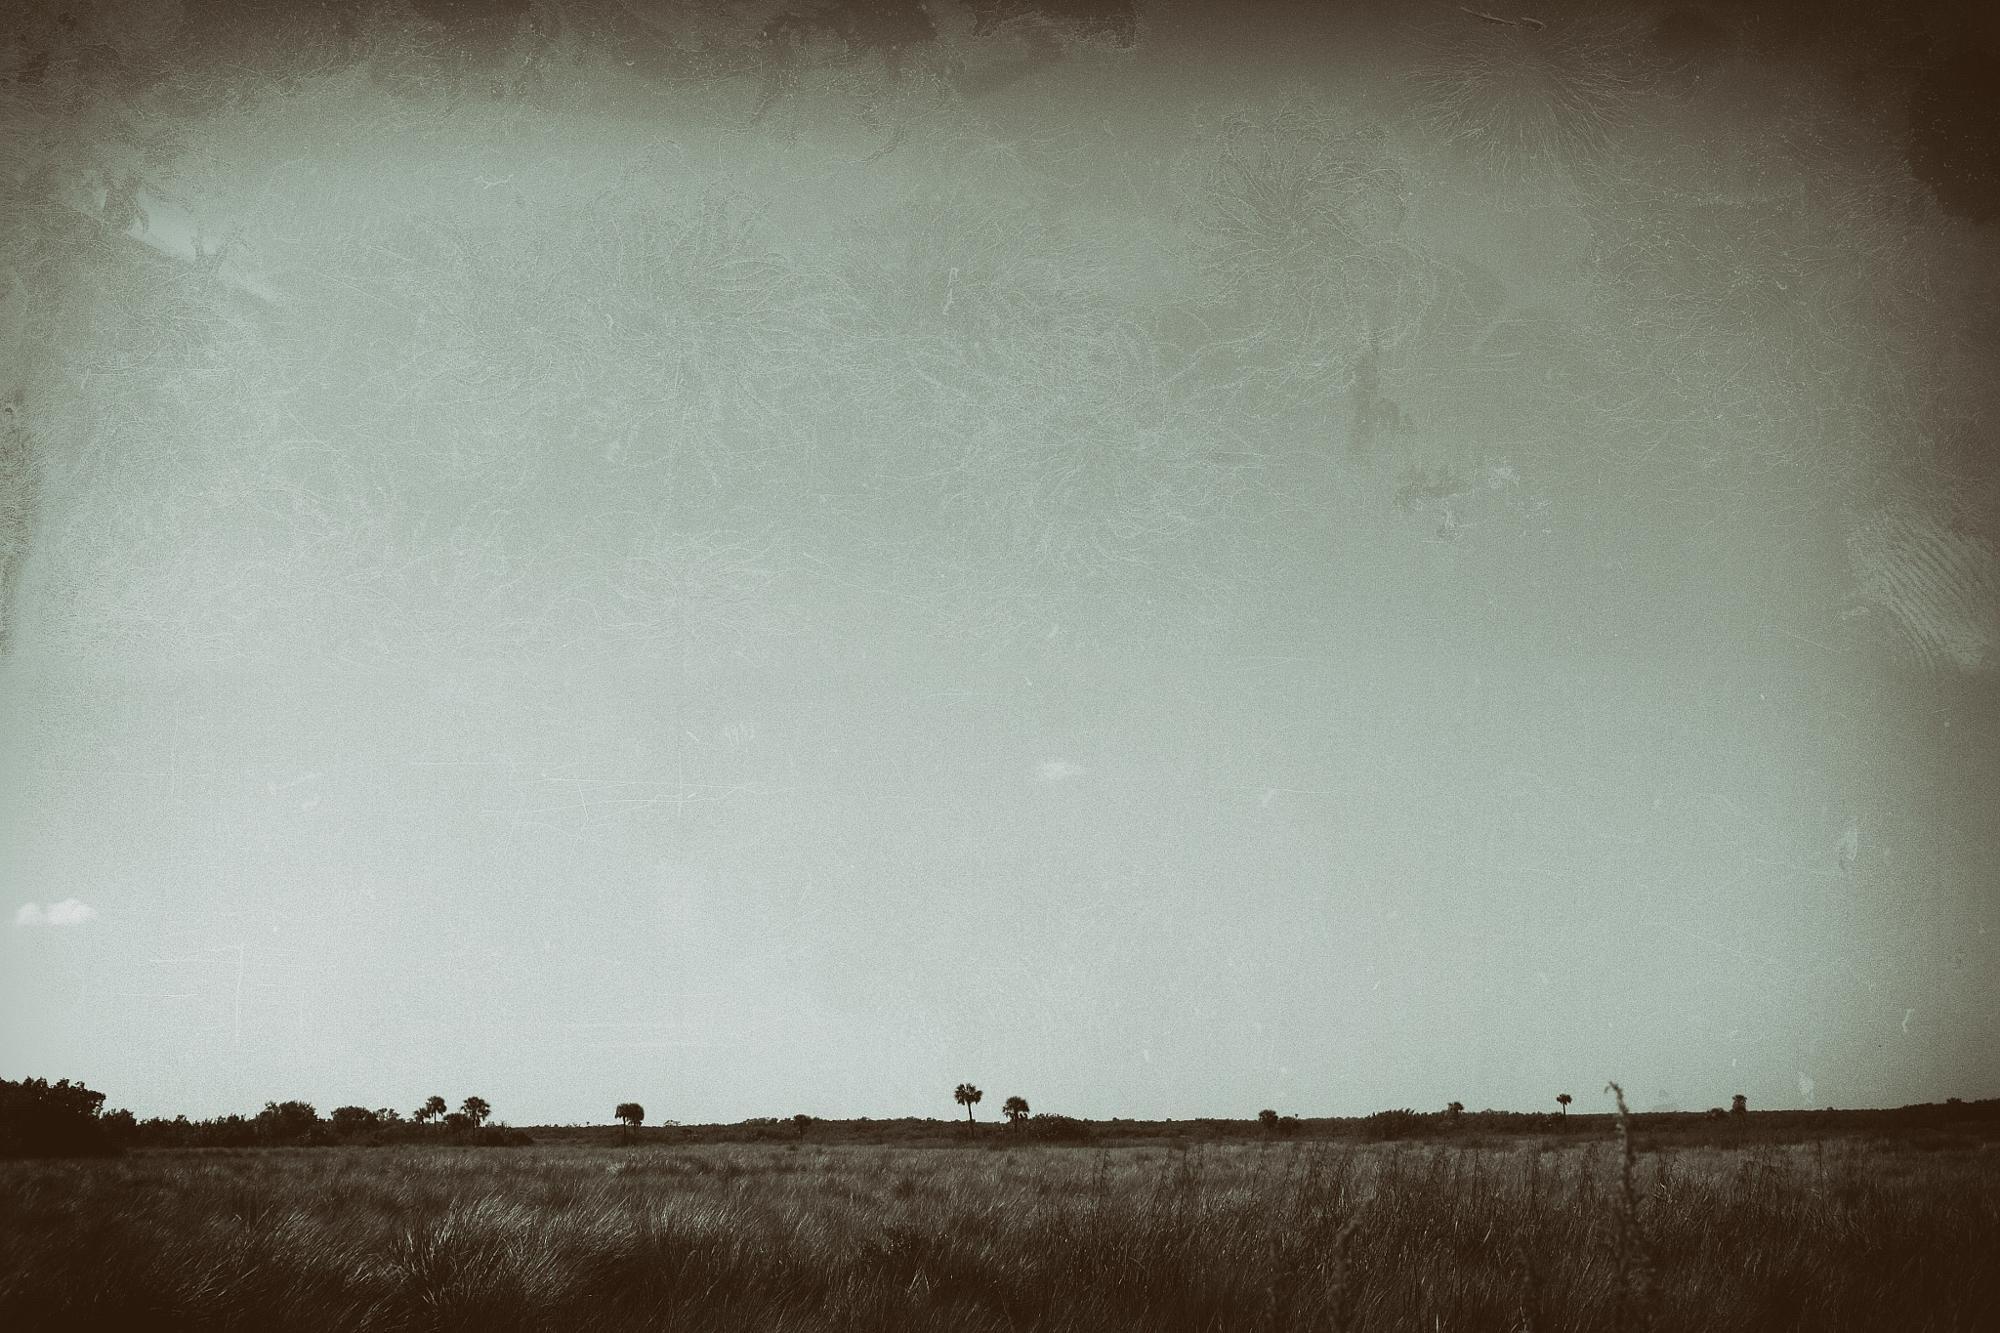 American Serengeti by David Stebbing